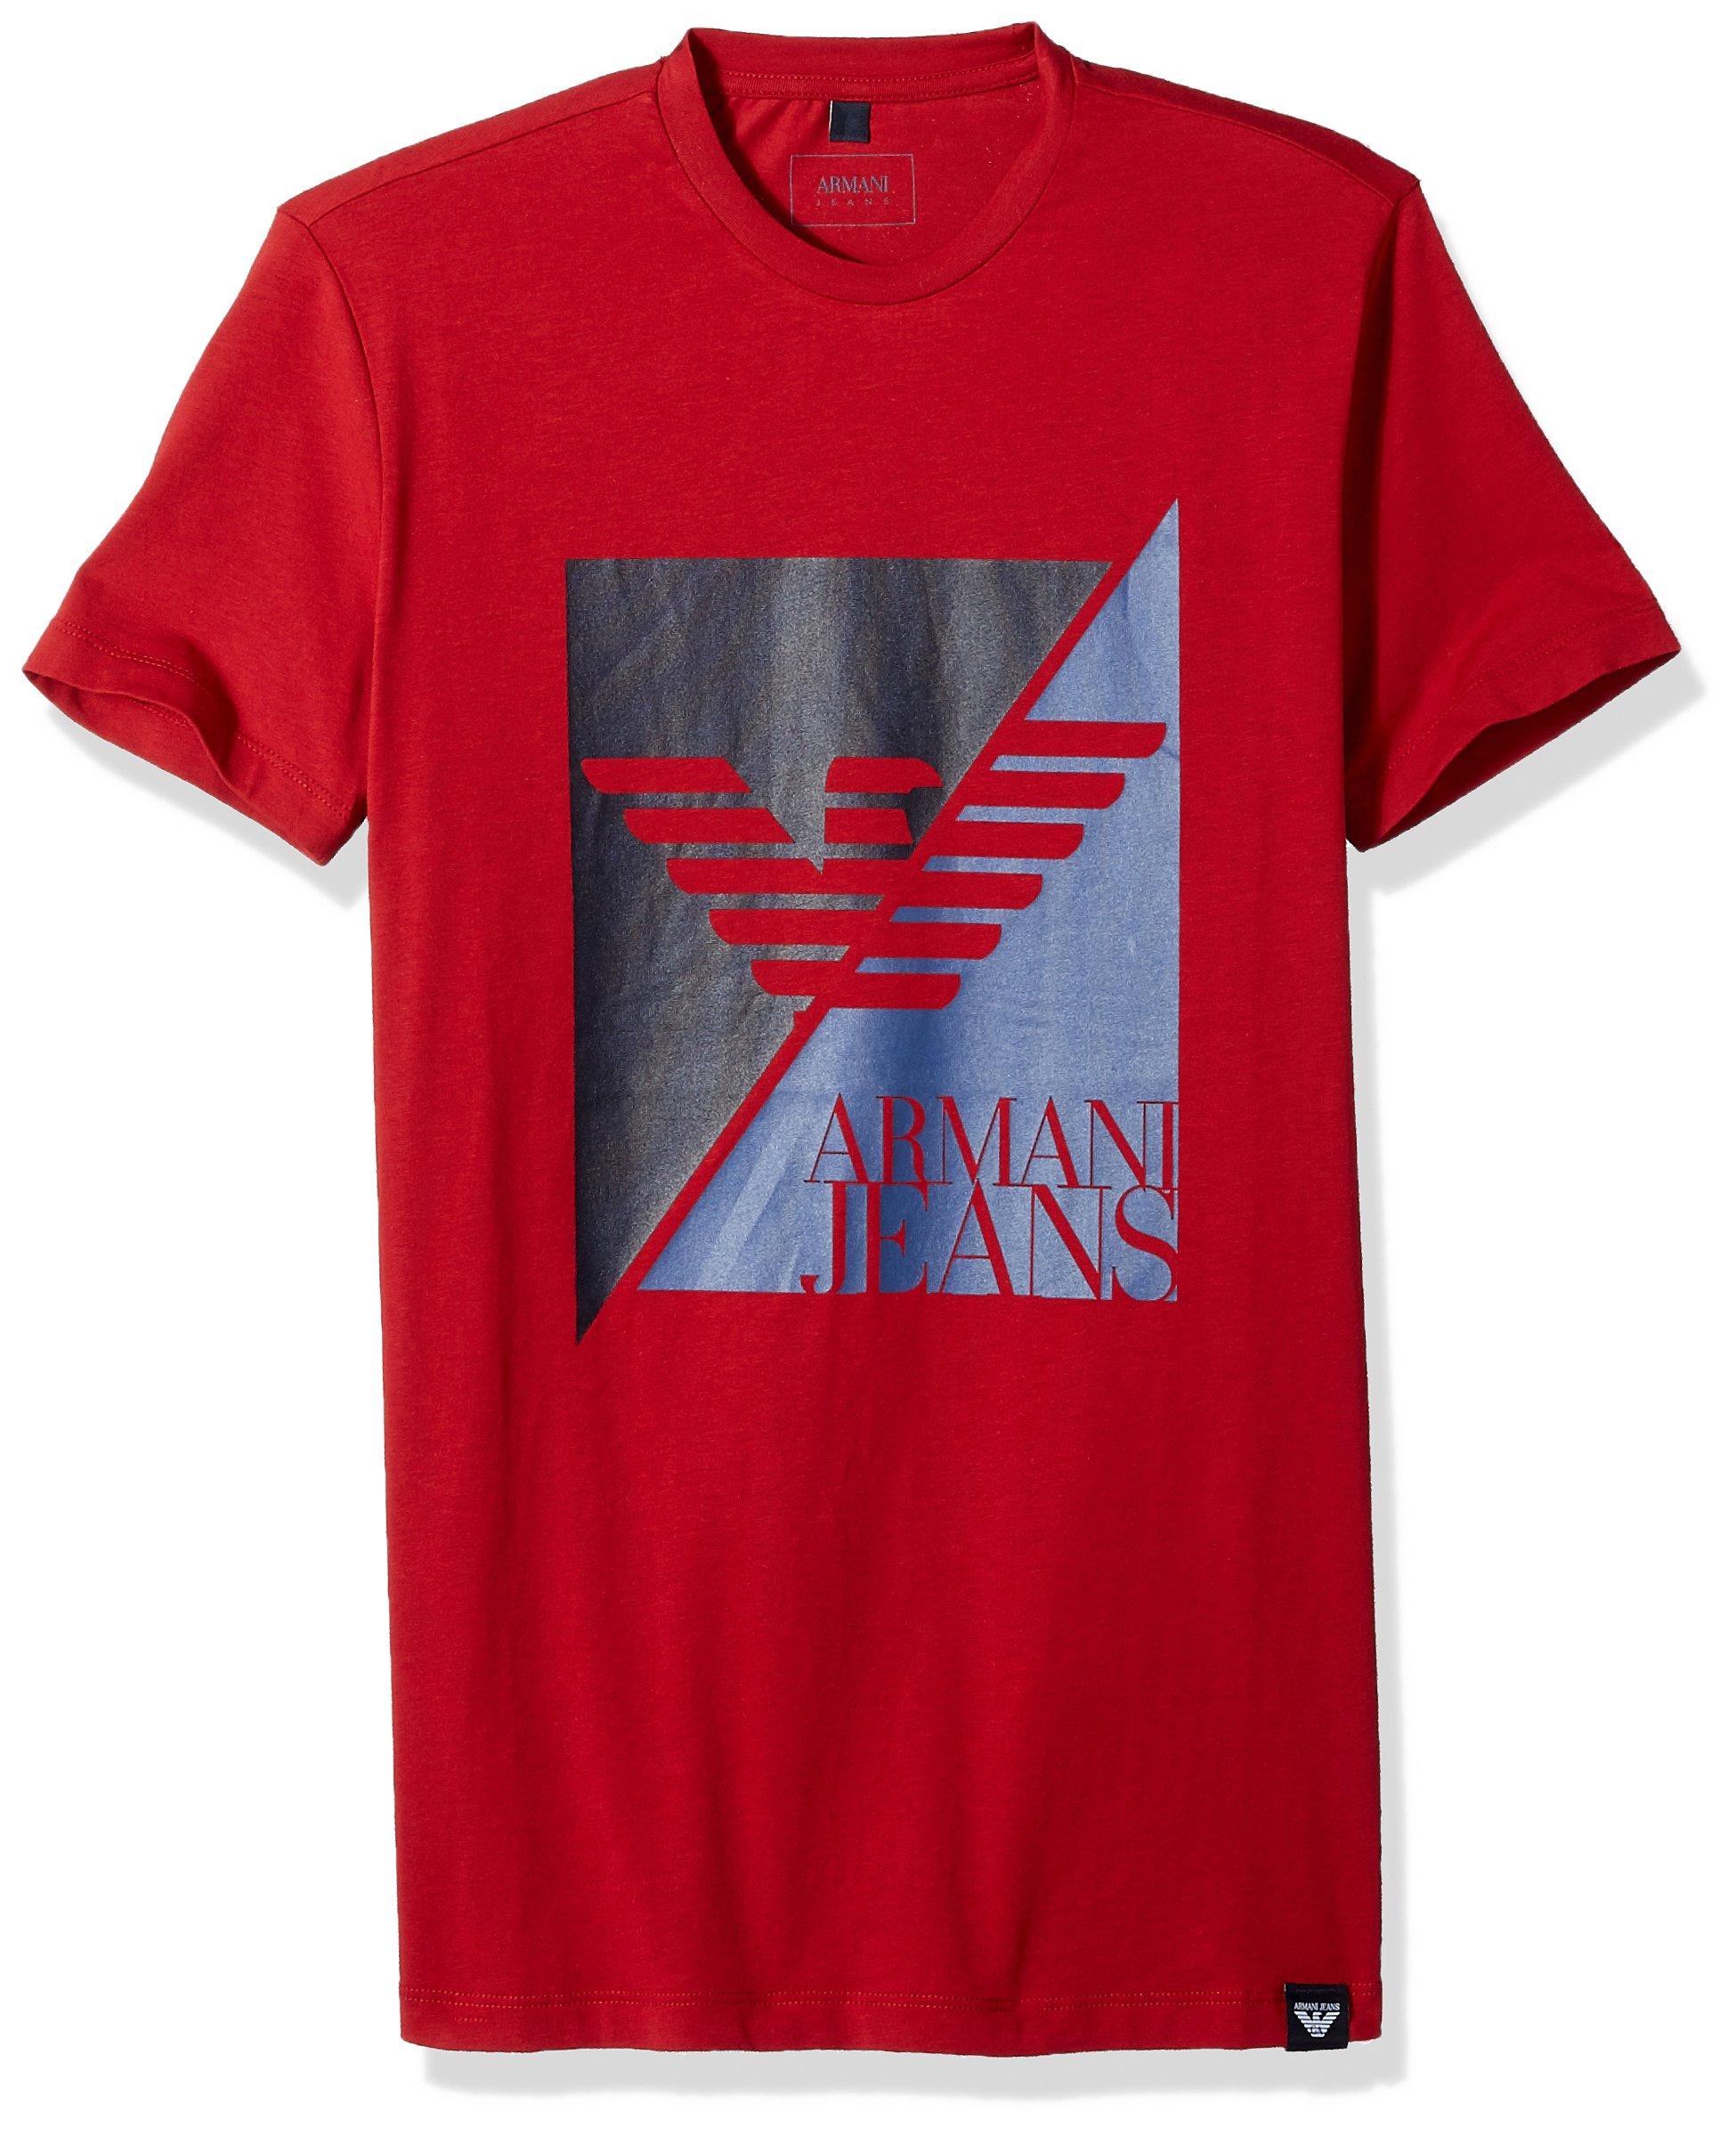 Armani Jeans Men's Split Eagle Logo T-Shirt, Red, Large